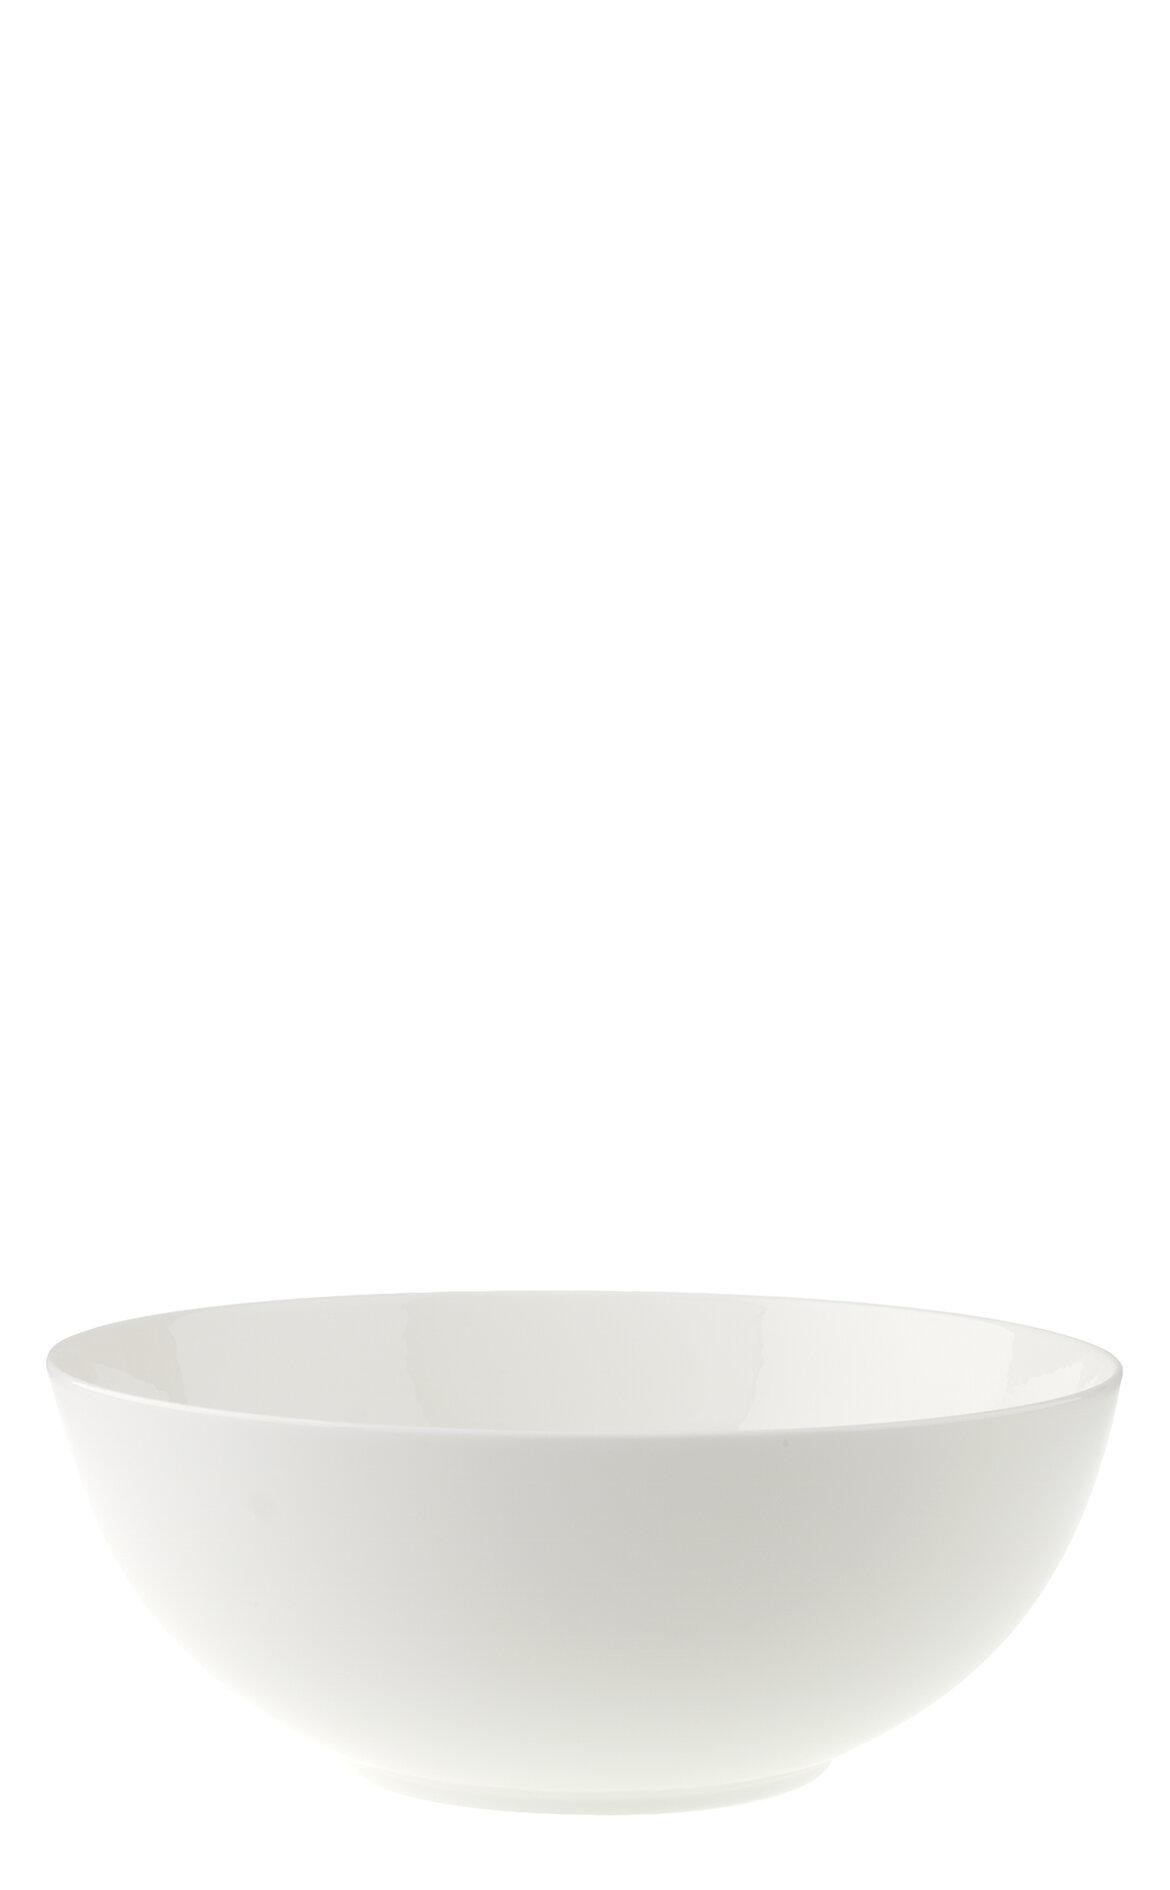 Villeroy & Boch Royal Salata Servis Kasesi, 21 cm.